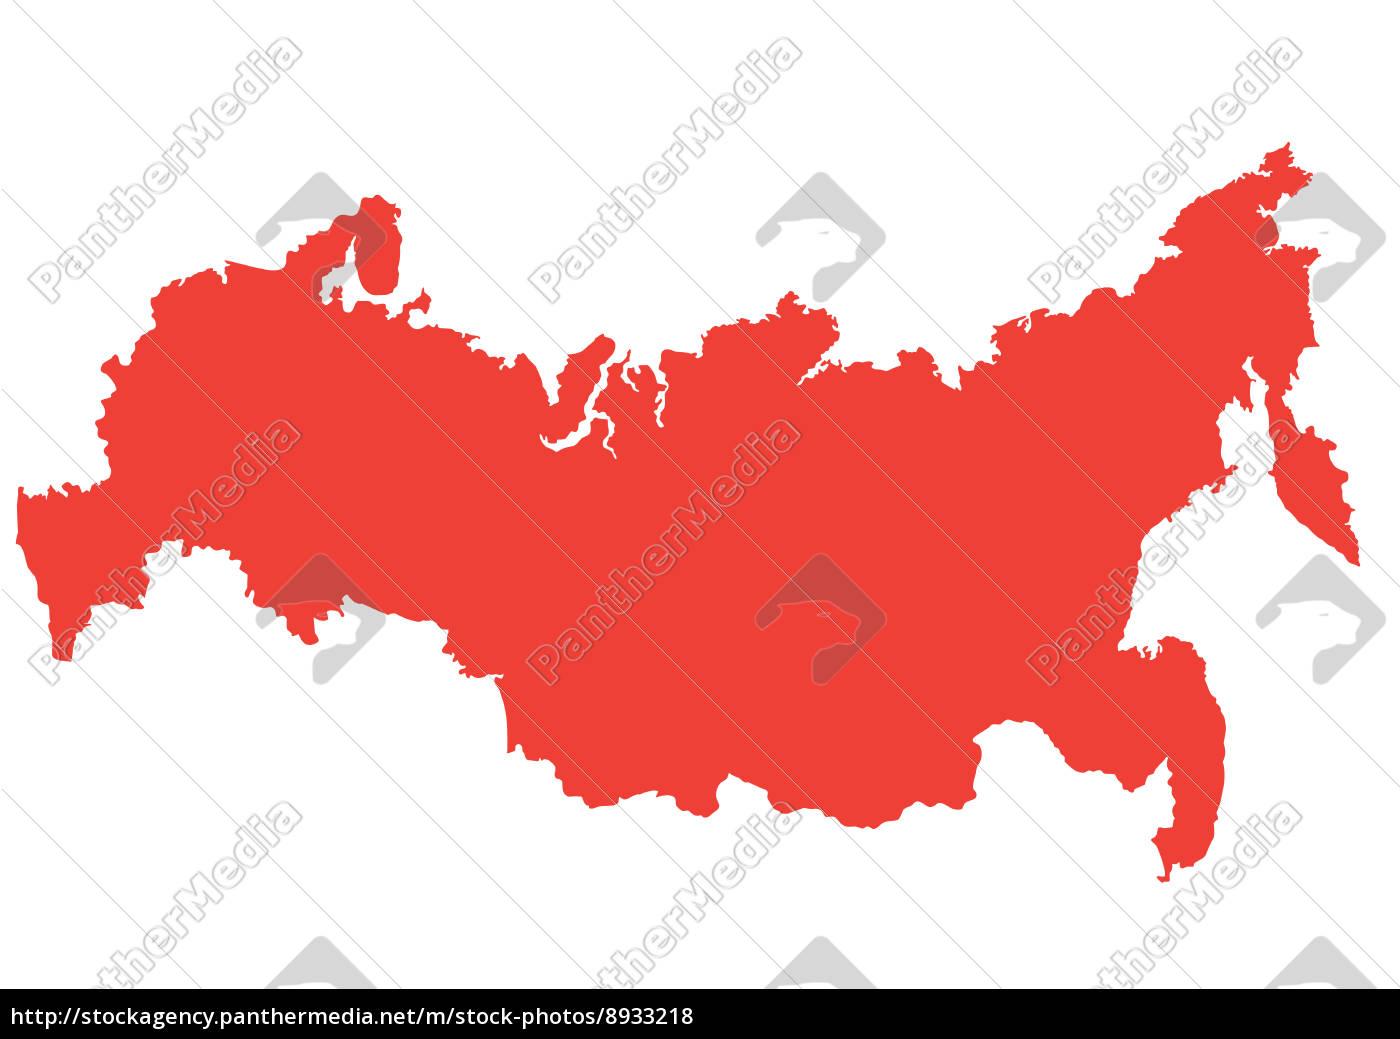 Vektor Kort Over Rusland Stockphoto 8933218 Panthermedia